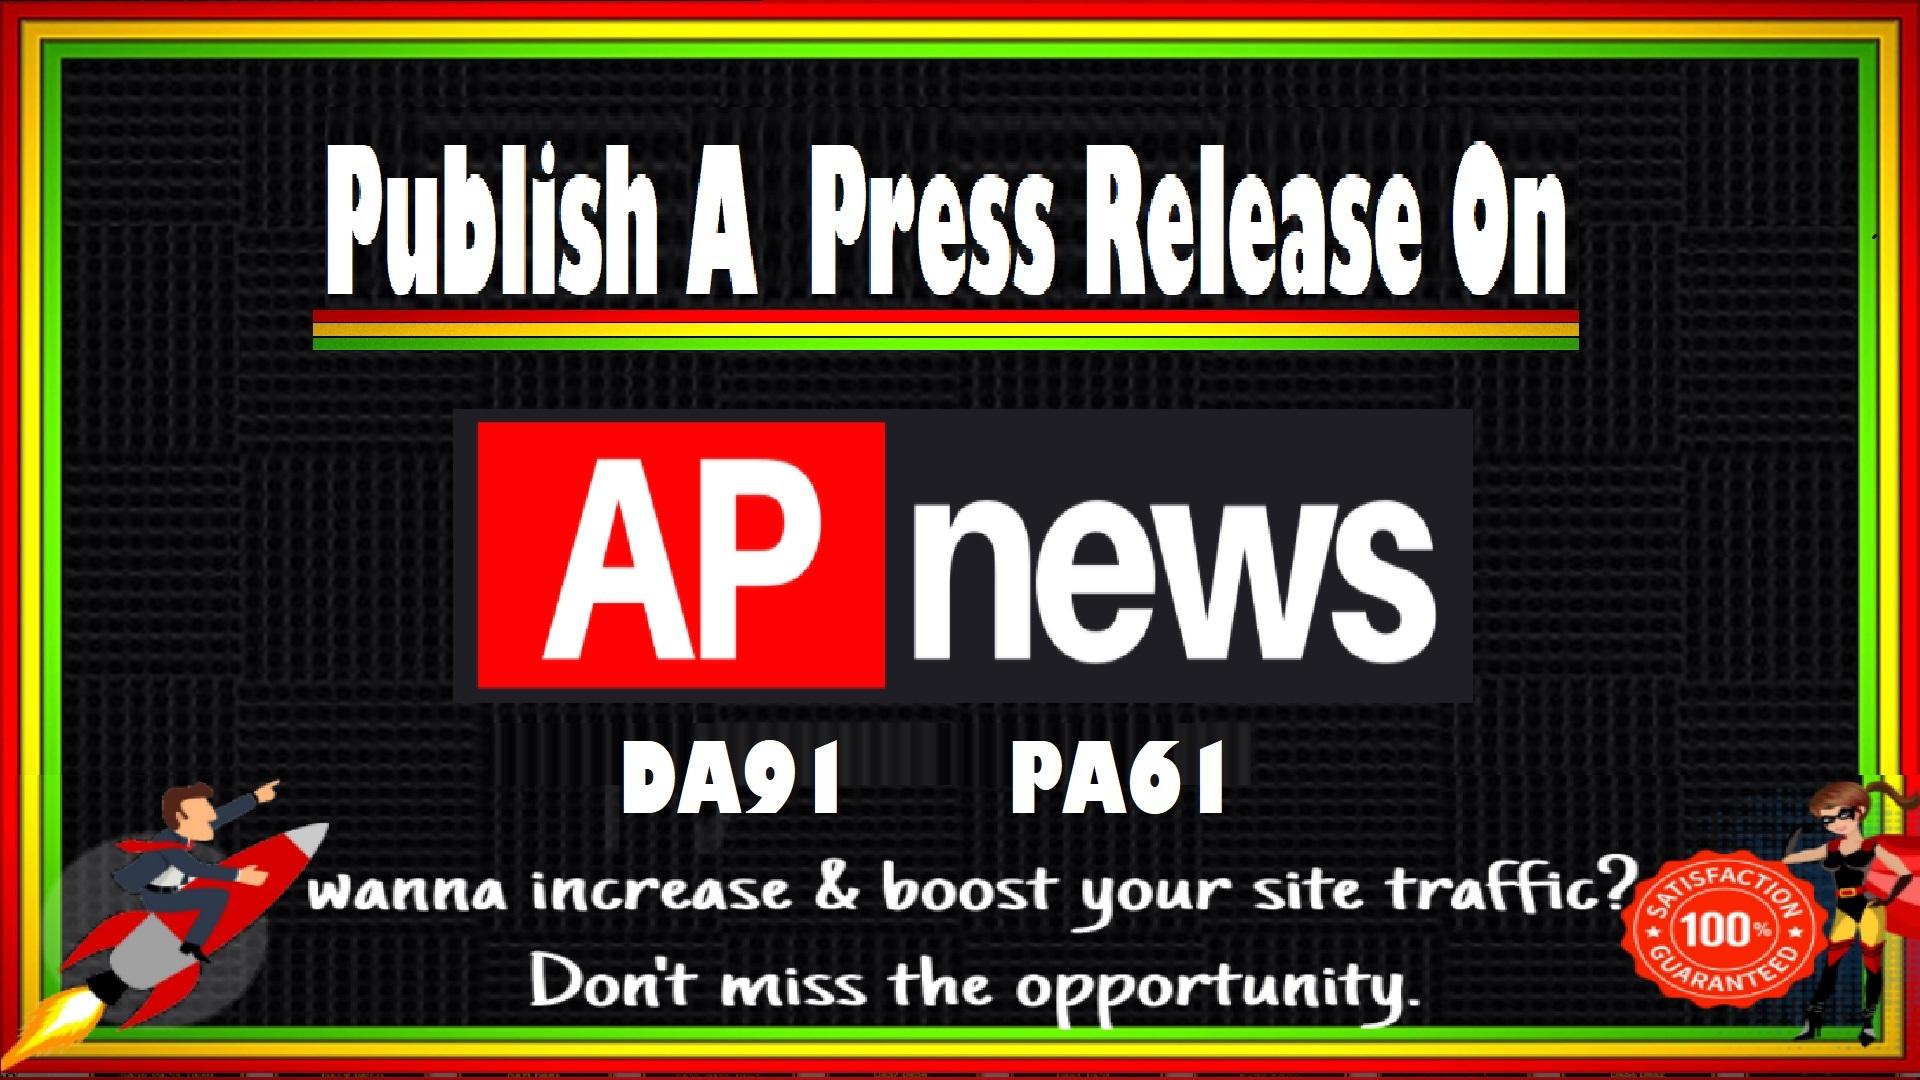 Publish a press Release on Apnews. com DA91 PA61